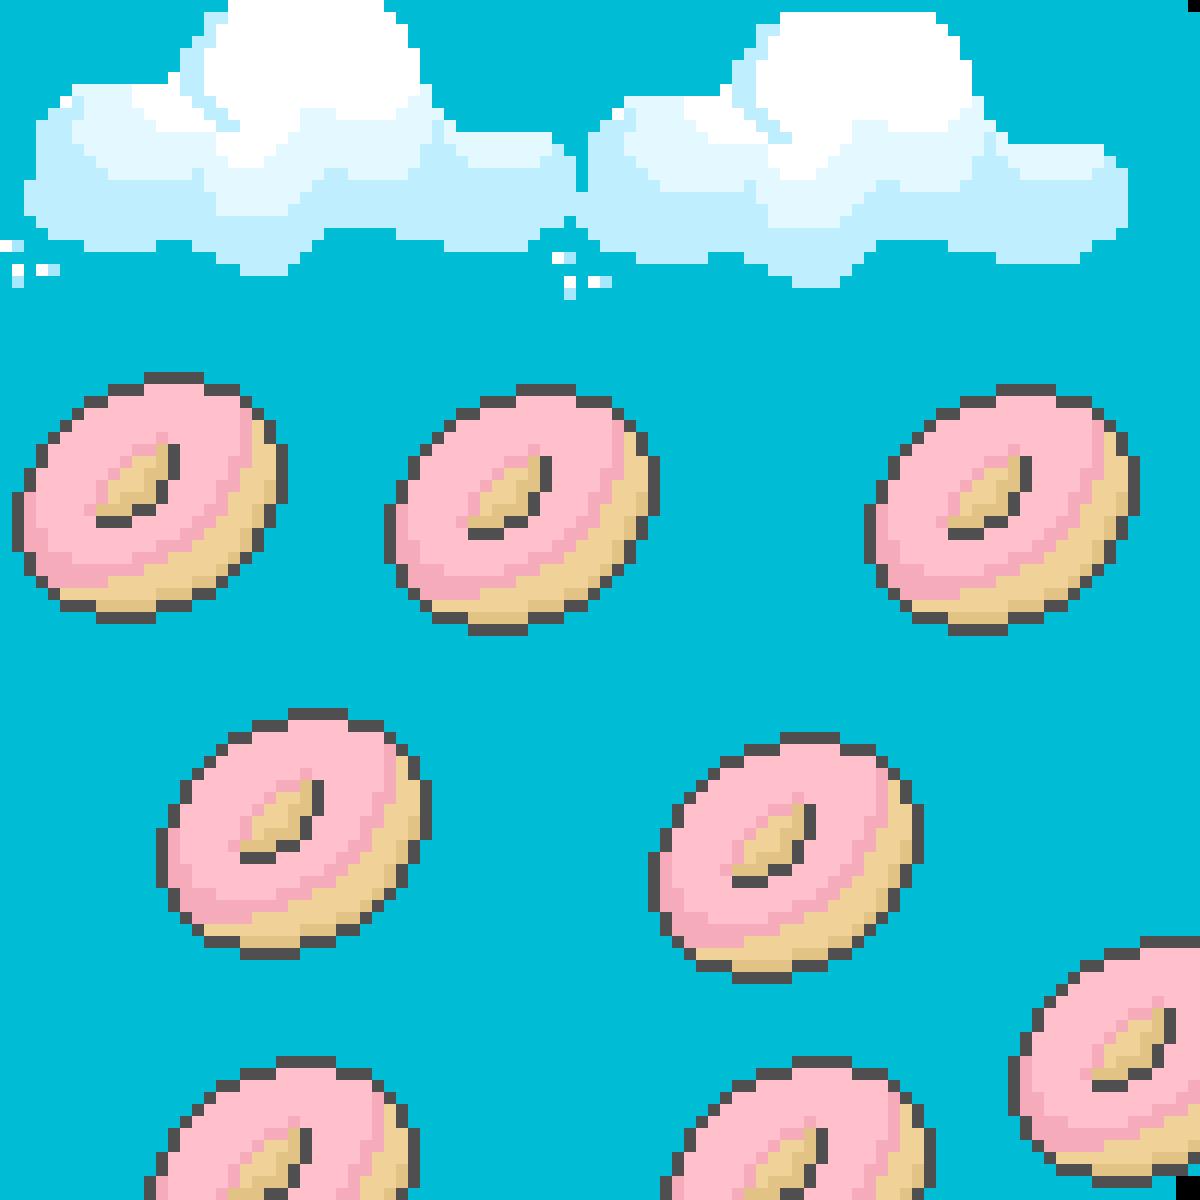 donuts by glassesgirl123